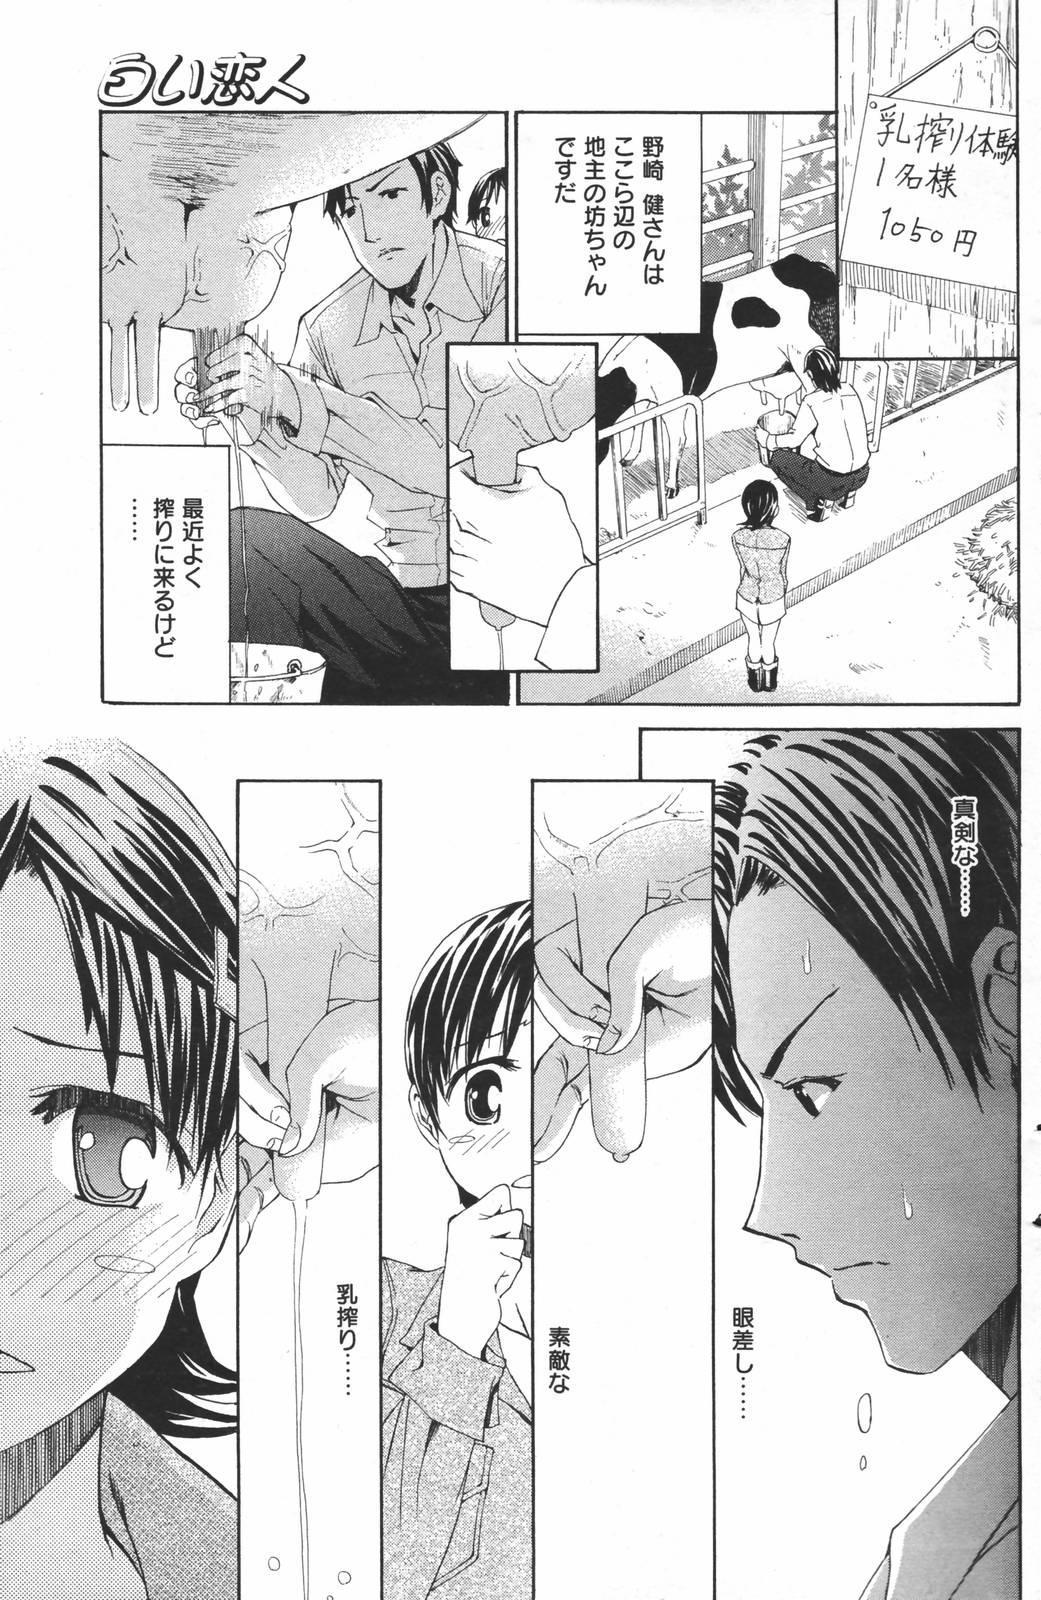 Manga Bangaichi 2007-03 128